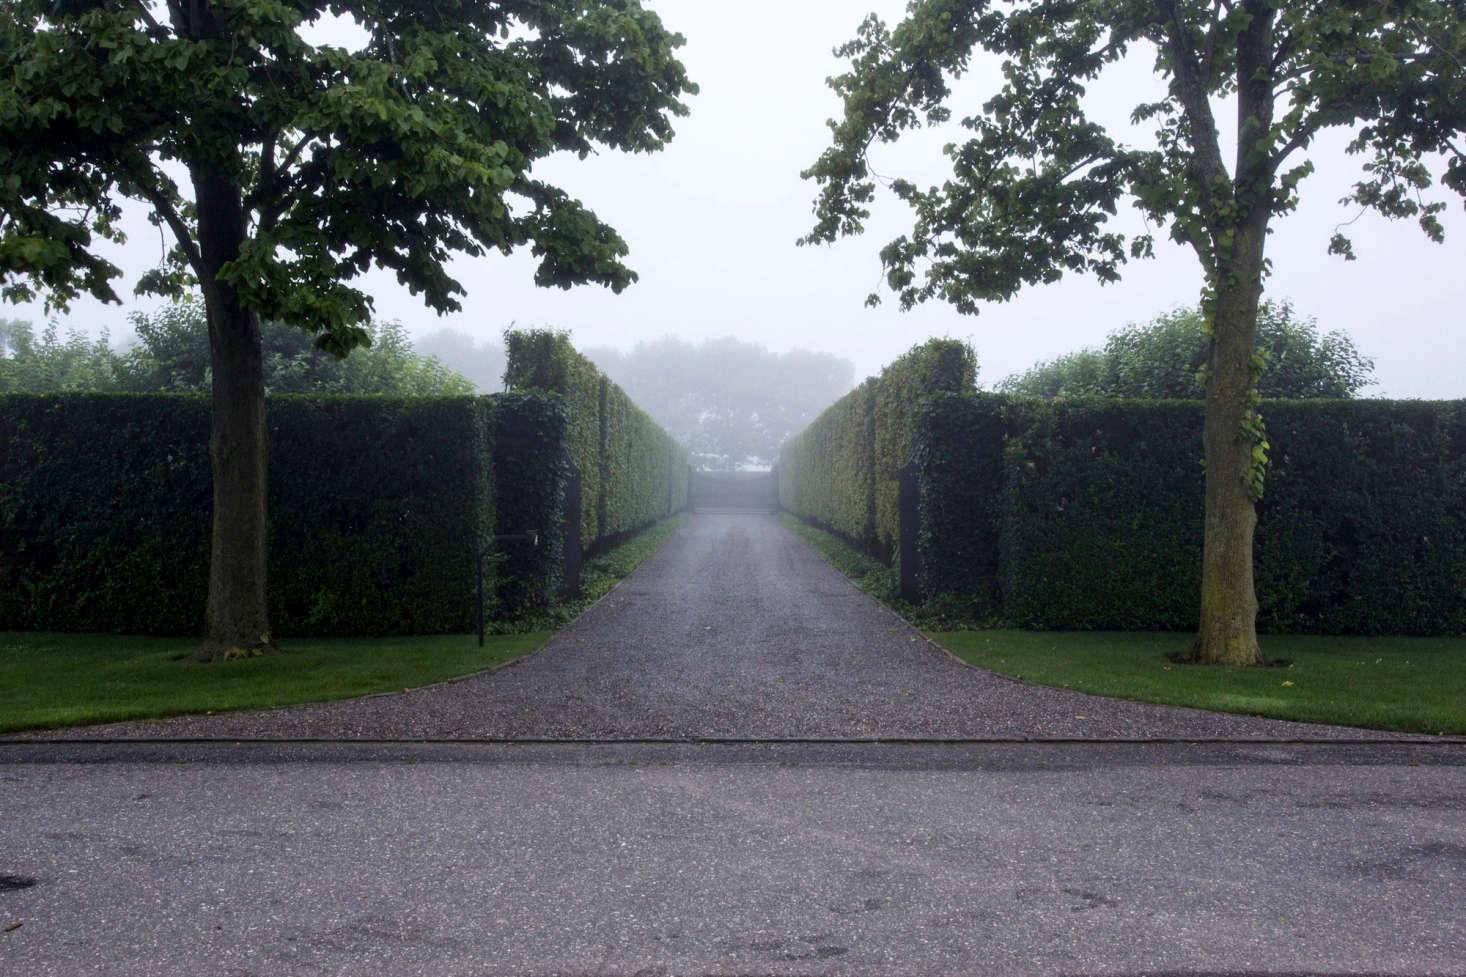 Hornbeams line driveway at entrance to Watermill, NY garden designer Quincy Hammond